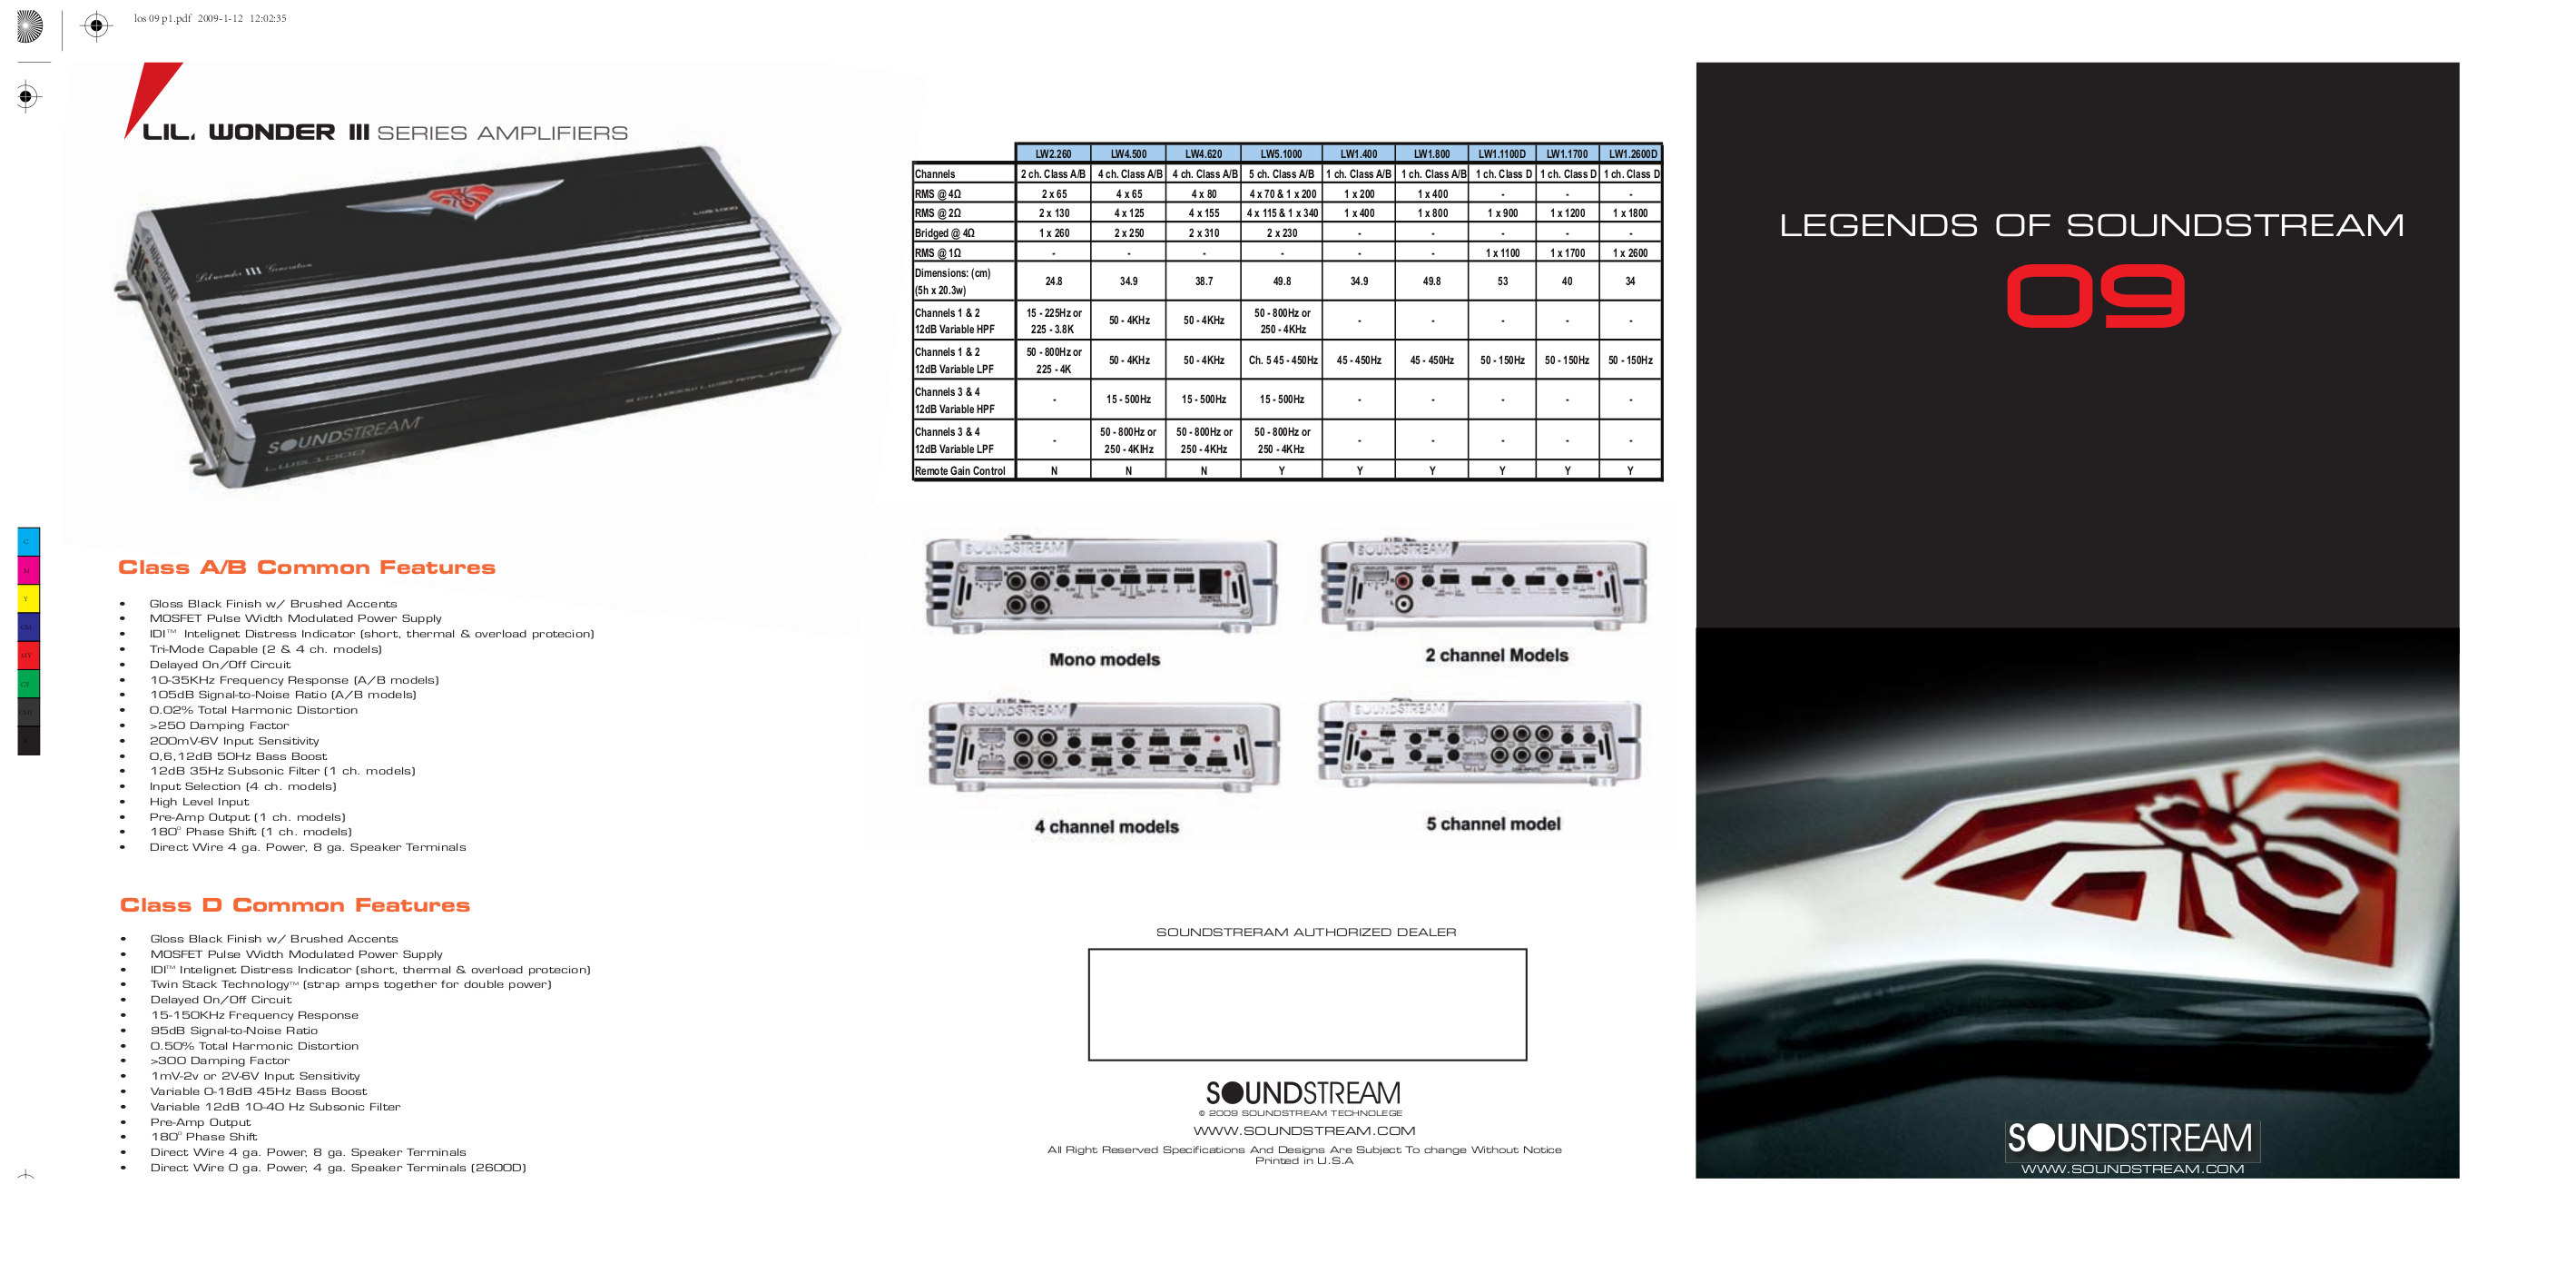 pdf for soundstream xpro subwoofer manual pdf for soundstream subwoofer xpro 12 manual